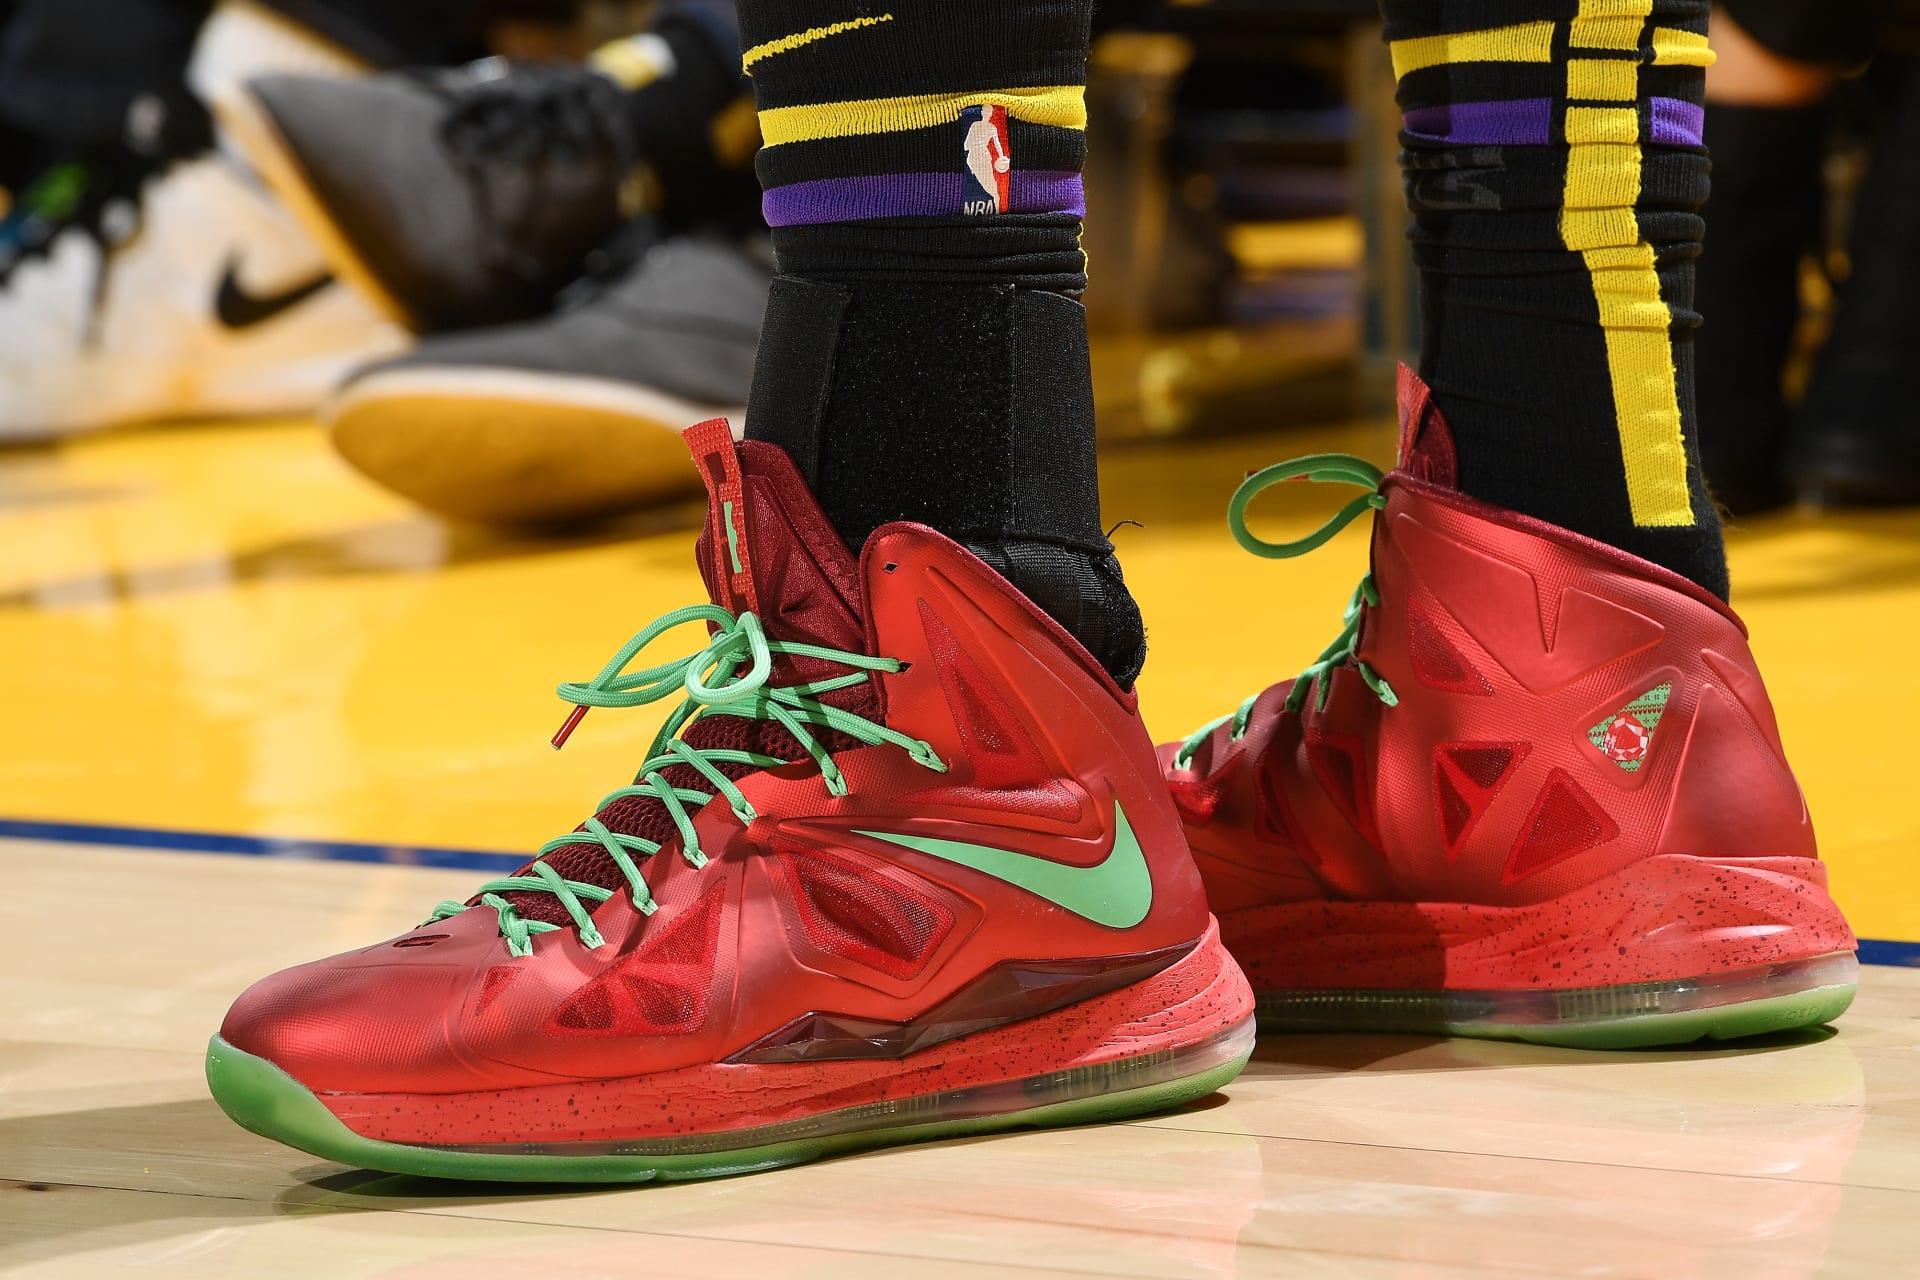 Lebron Christmas 10.Nba Christmas Shoes Best Sneakers Worn On Christmas Day